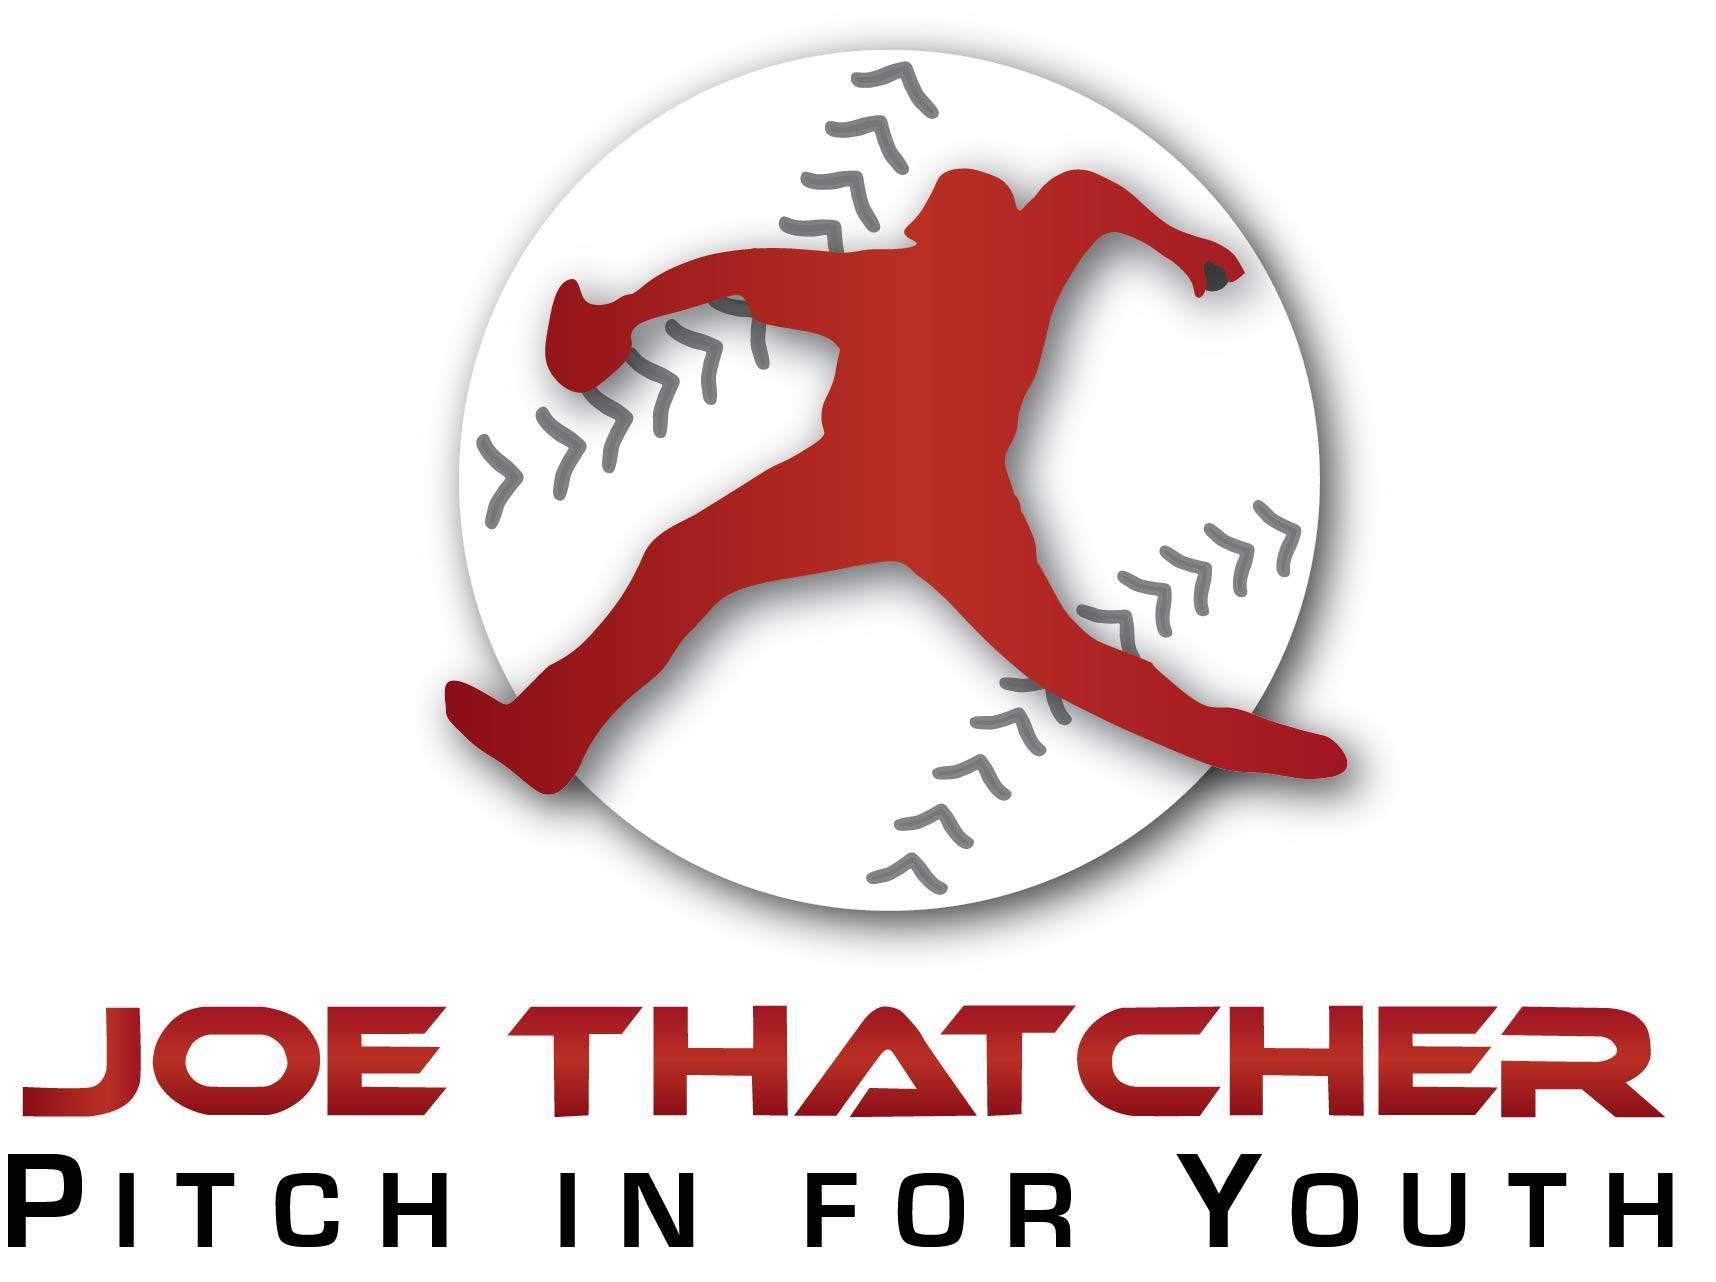 Joe Thatcher